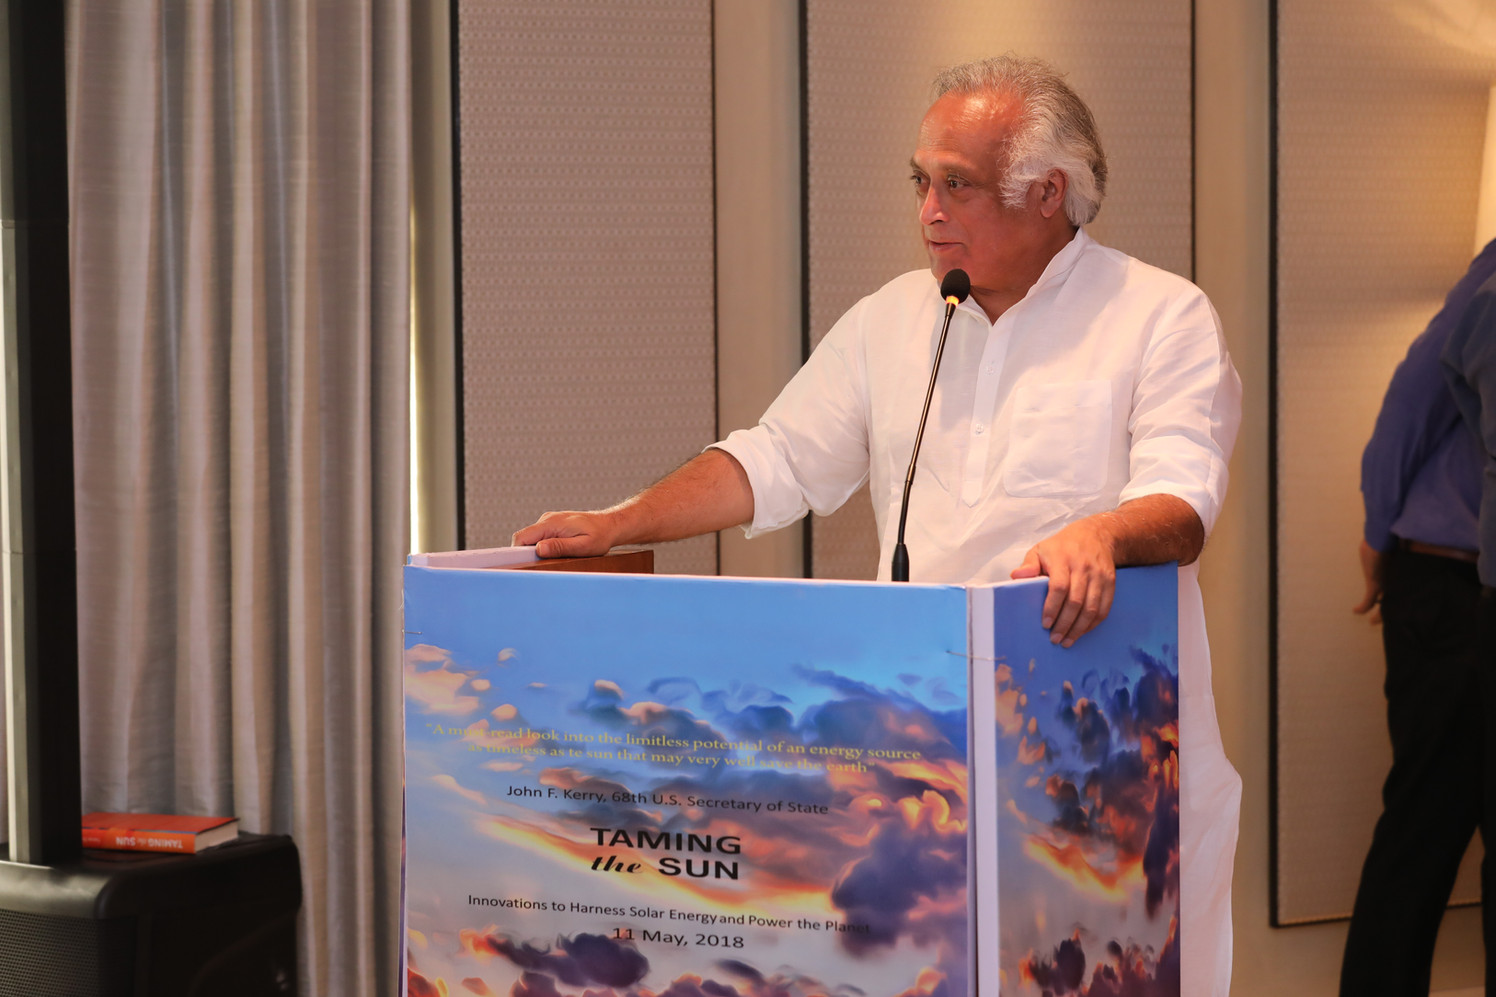 Former Indian Environment Minister Jairam Ramesh Launches Taming the Sun in New Delhi